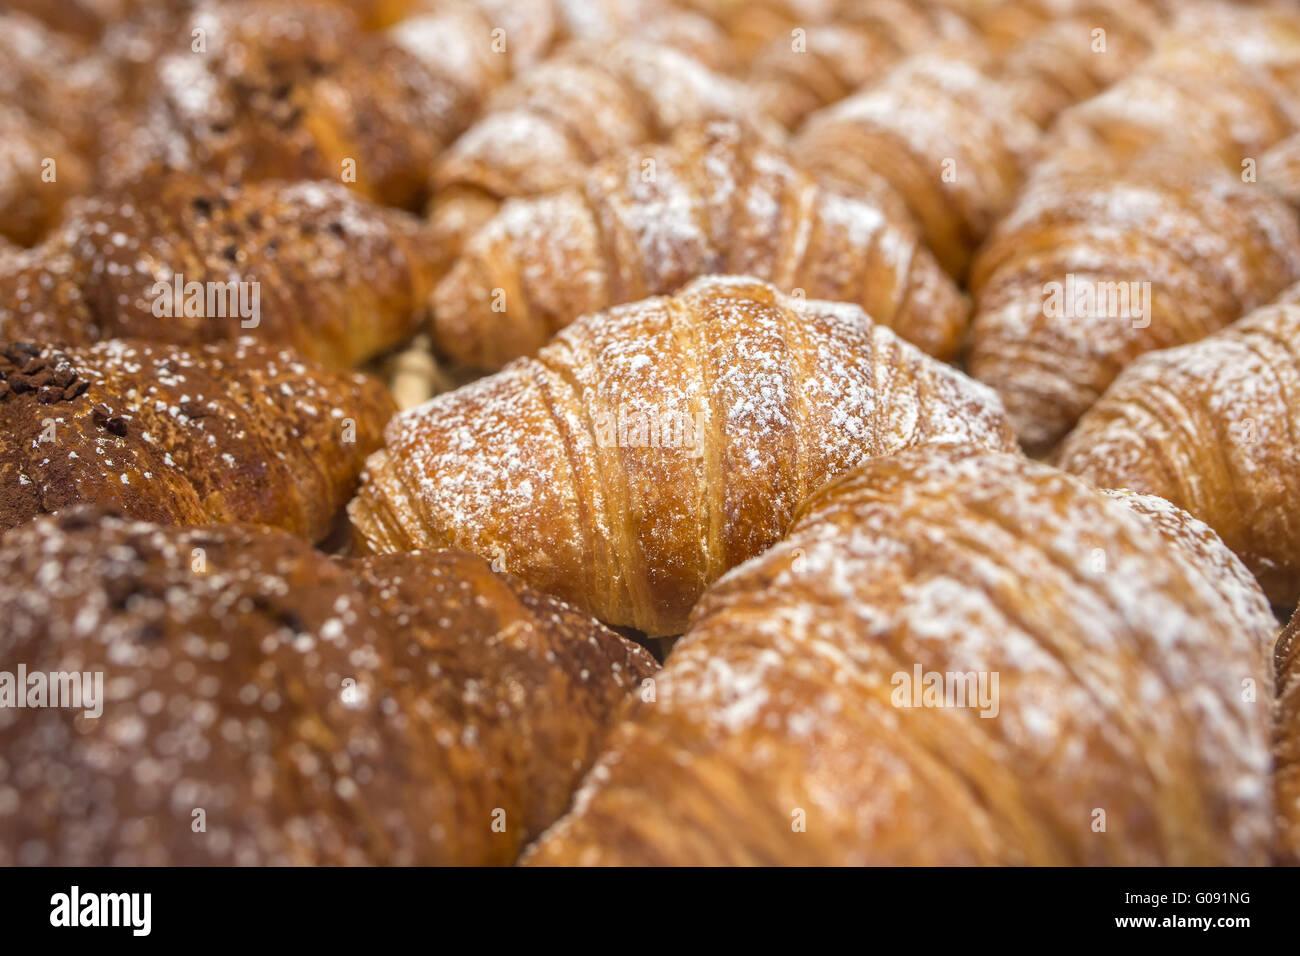 Freshly baked italian croissants (cornetti) background. Low depth of field - Stock Image